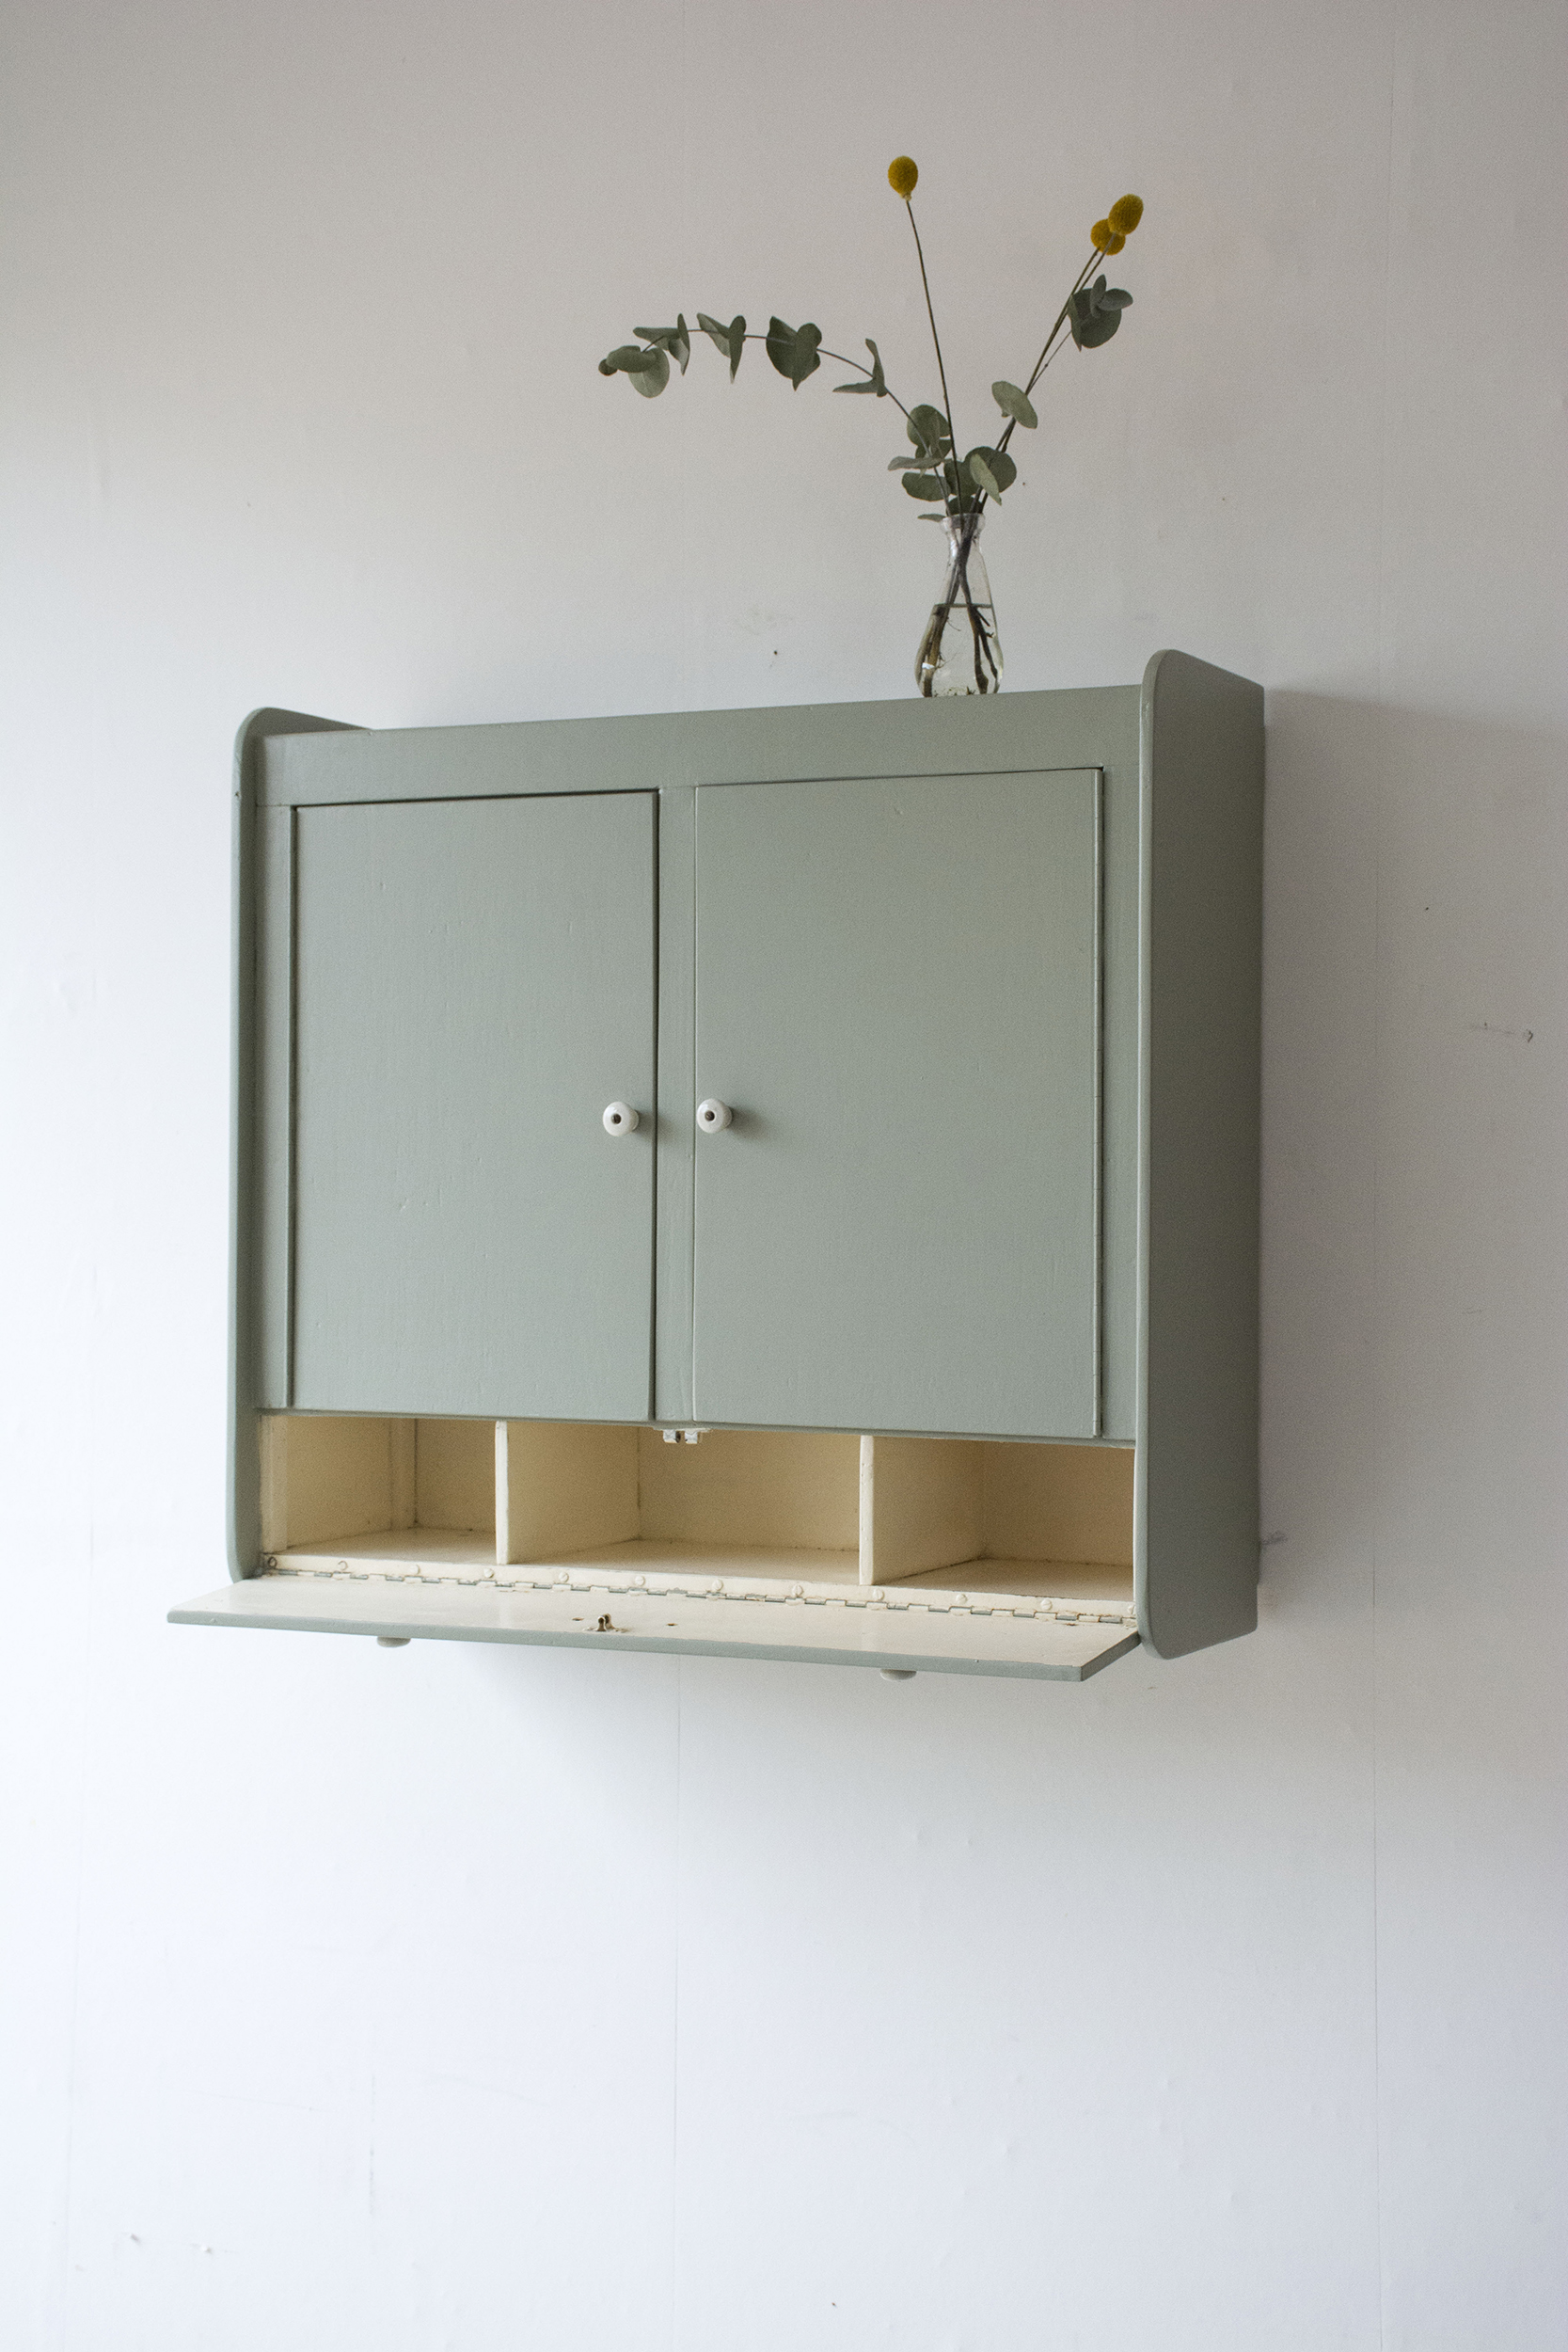 tijmgroen wandkastje met deurtjes en klepla - Firma zoethout_3.jpg